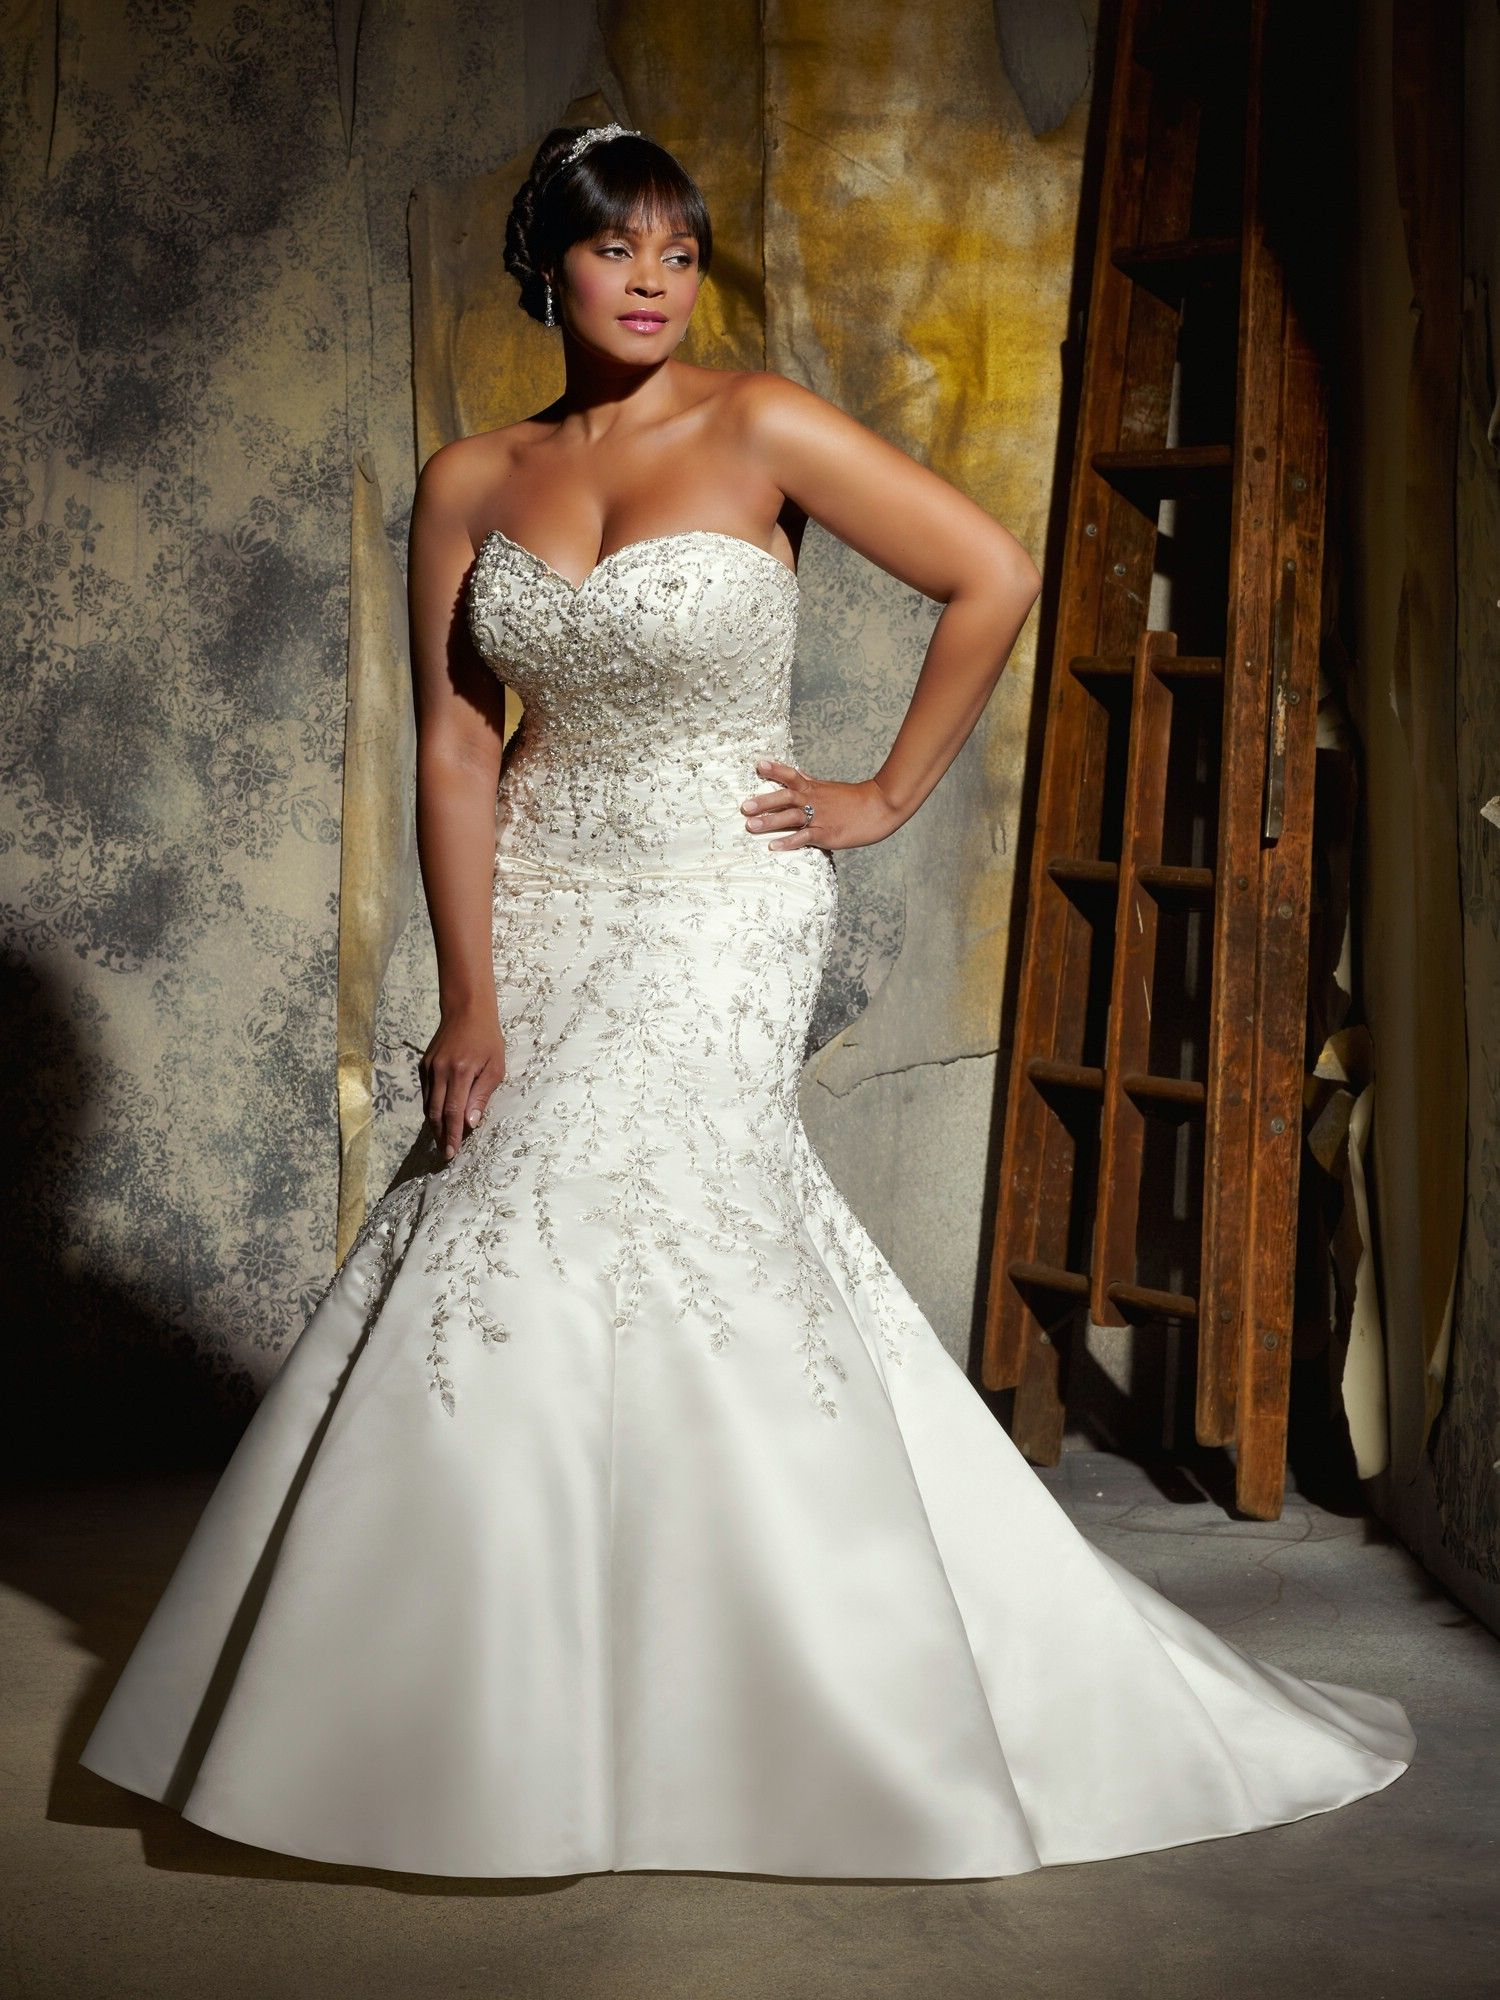 plus size wedding dresses plus size wedding dresses plus size wedding dresses mermaid style google search